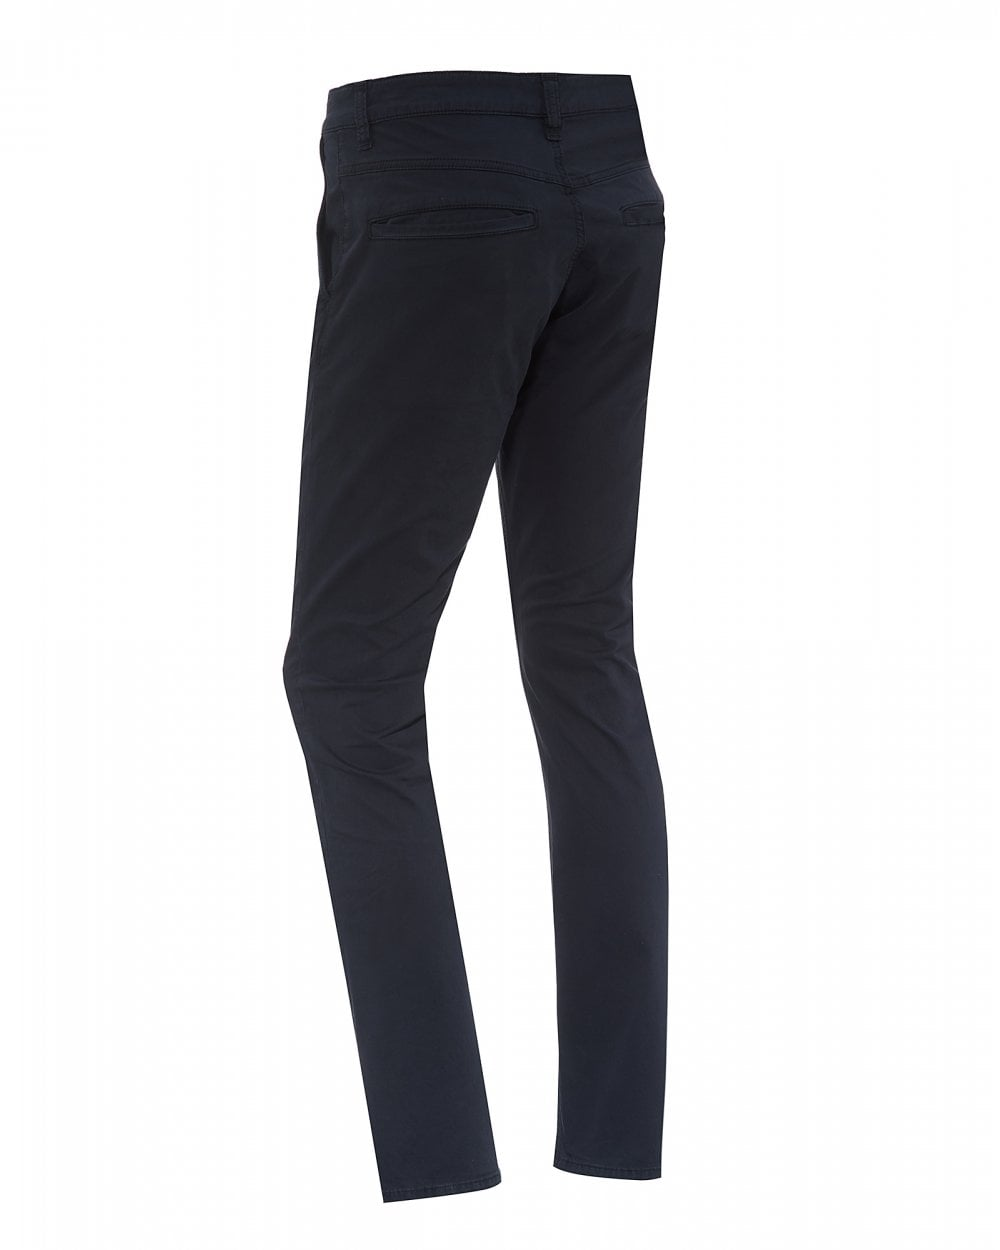 7cdcc542067 Nudie Jeans Mens Slim Adam Chinos, Dark Midnight Trousers